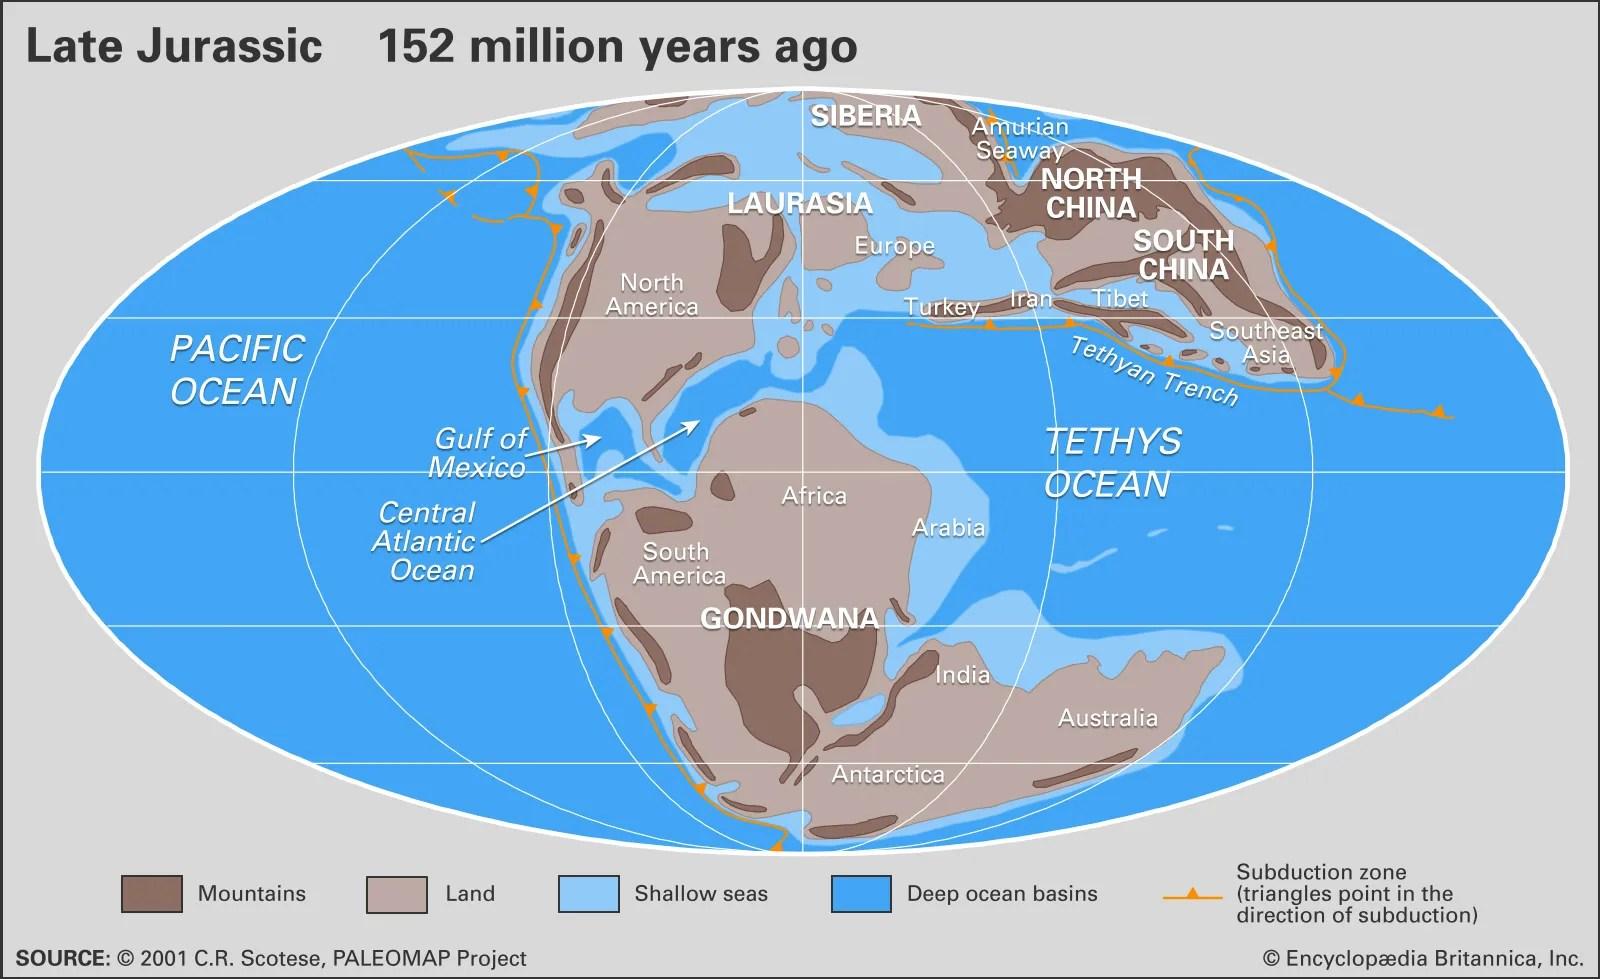 Jurassic Period